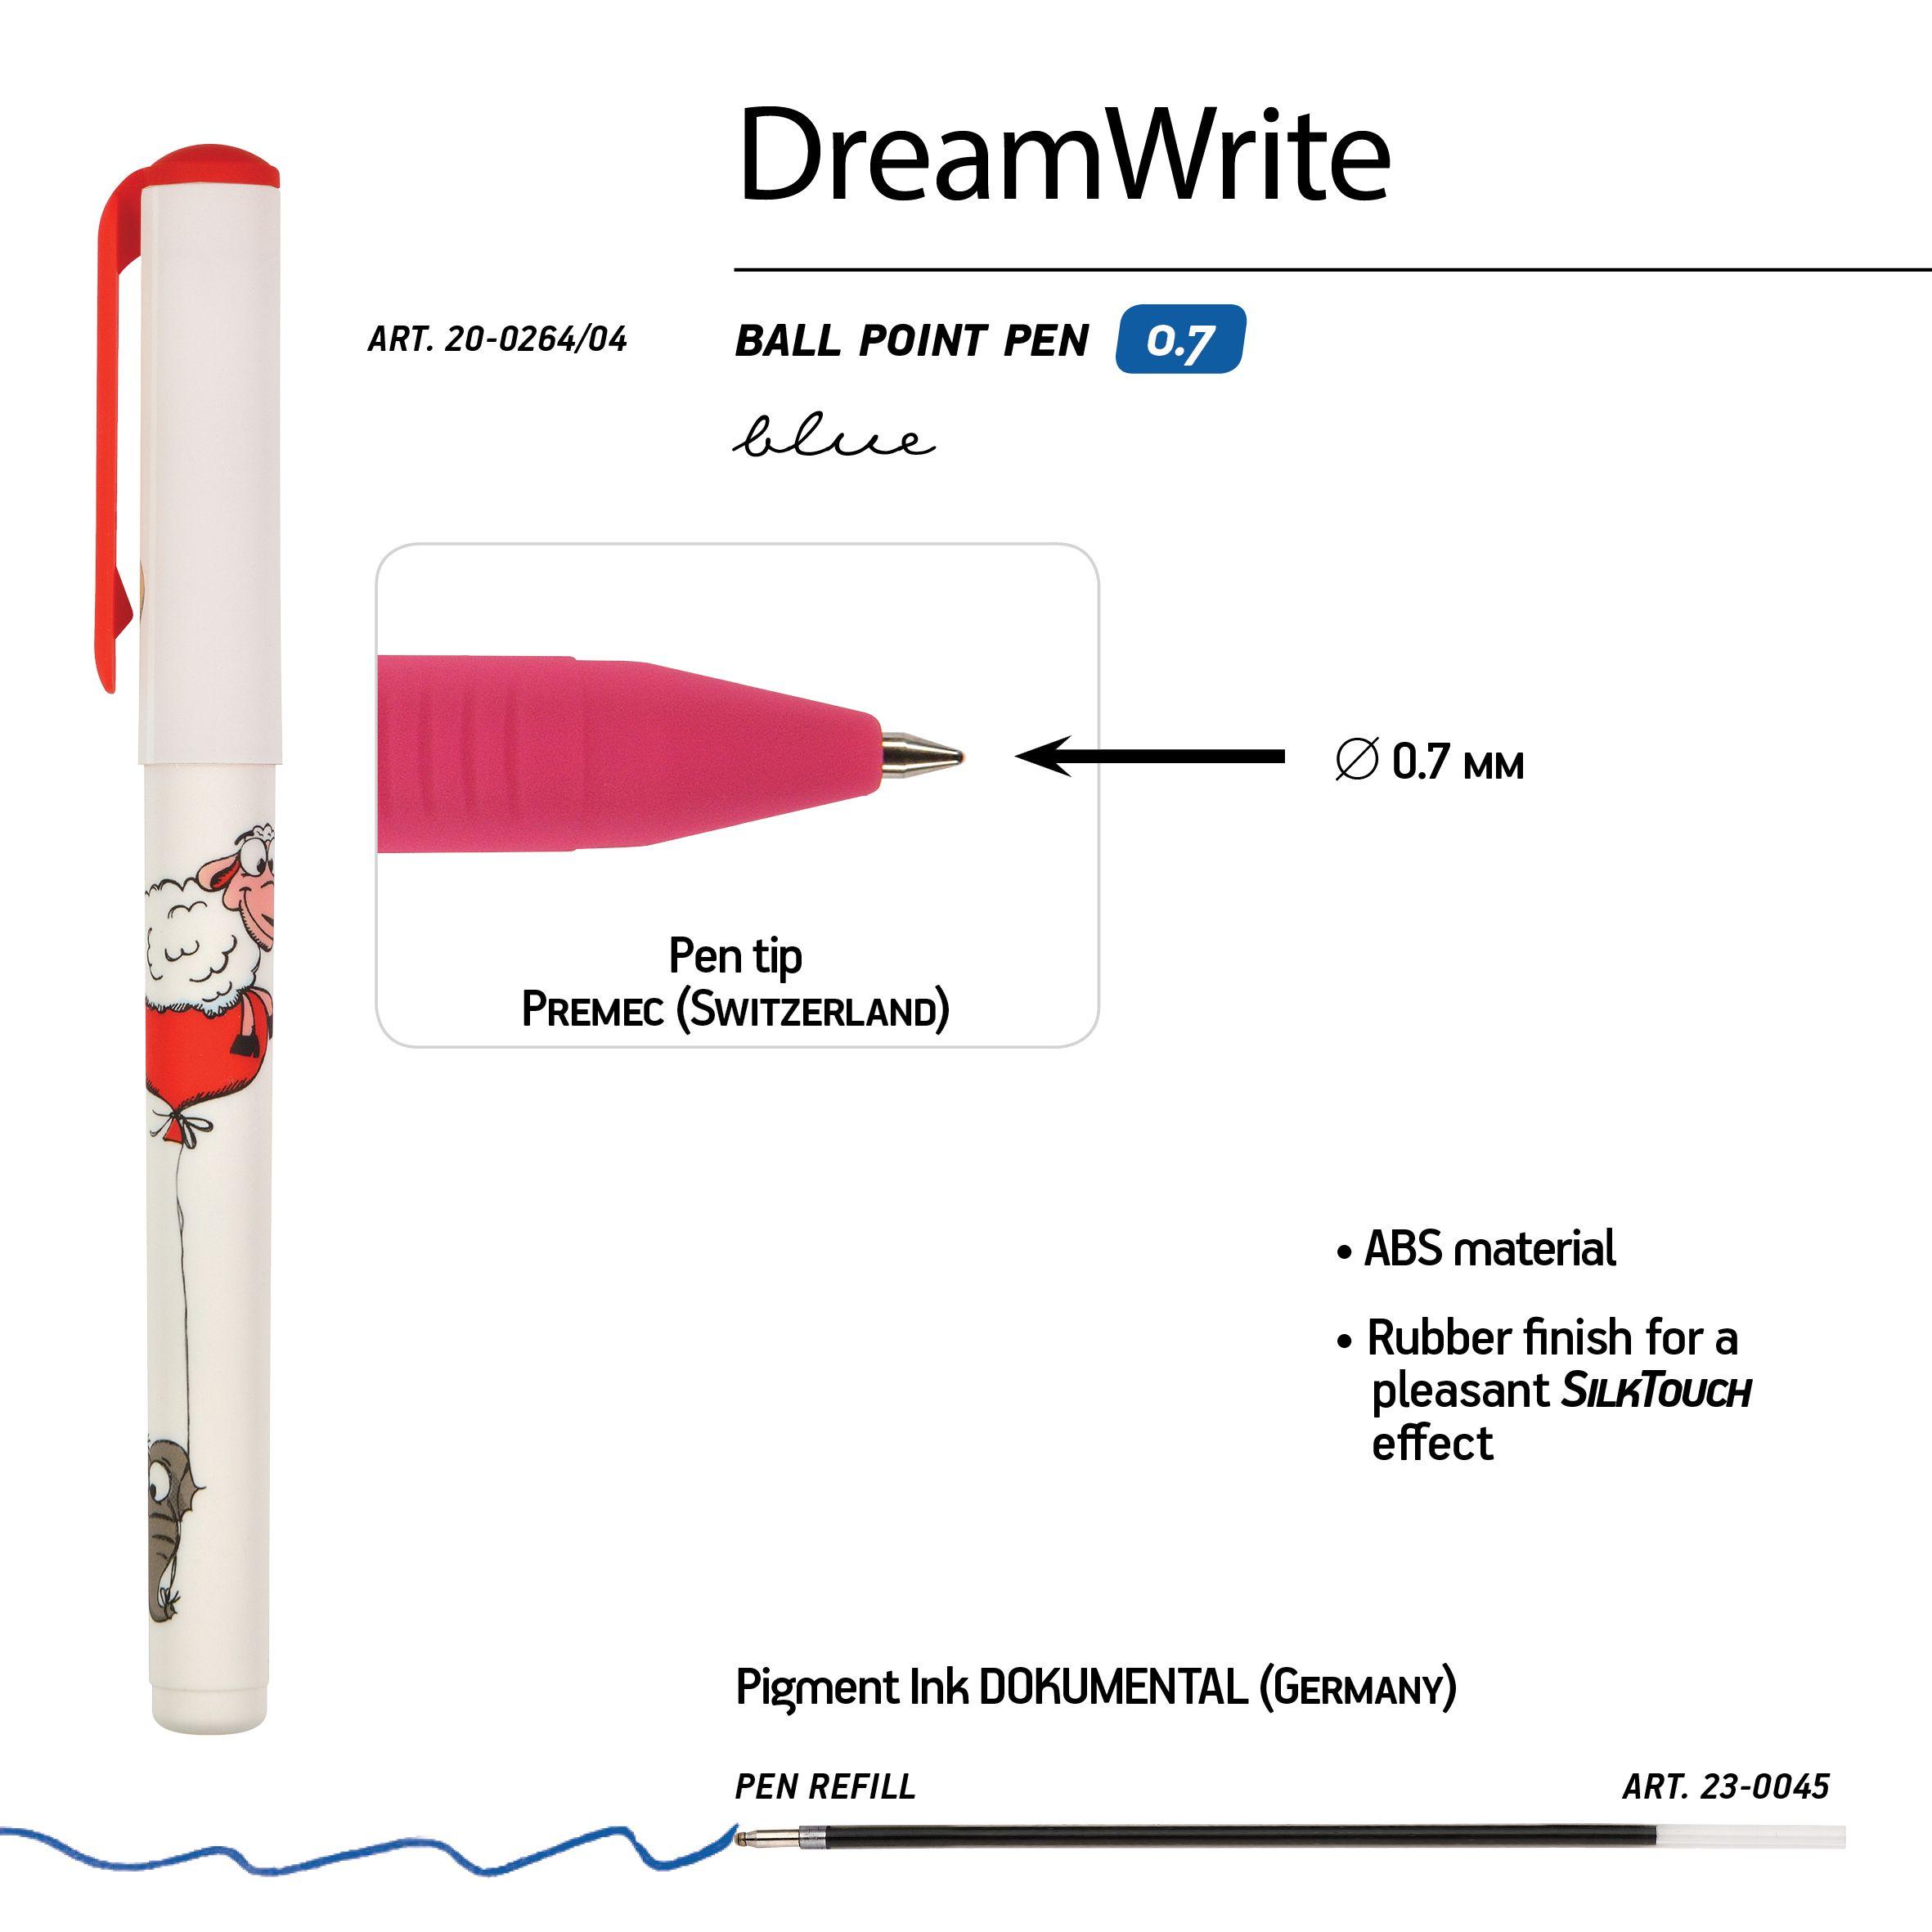 Ручка подар шар BV DreamWrite синяя 0,7мм Мультяшные зверушки 3 вида